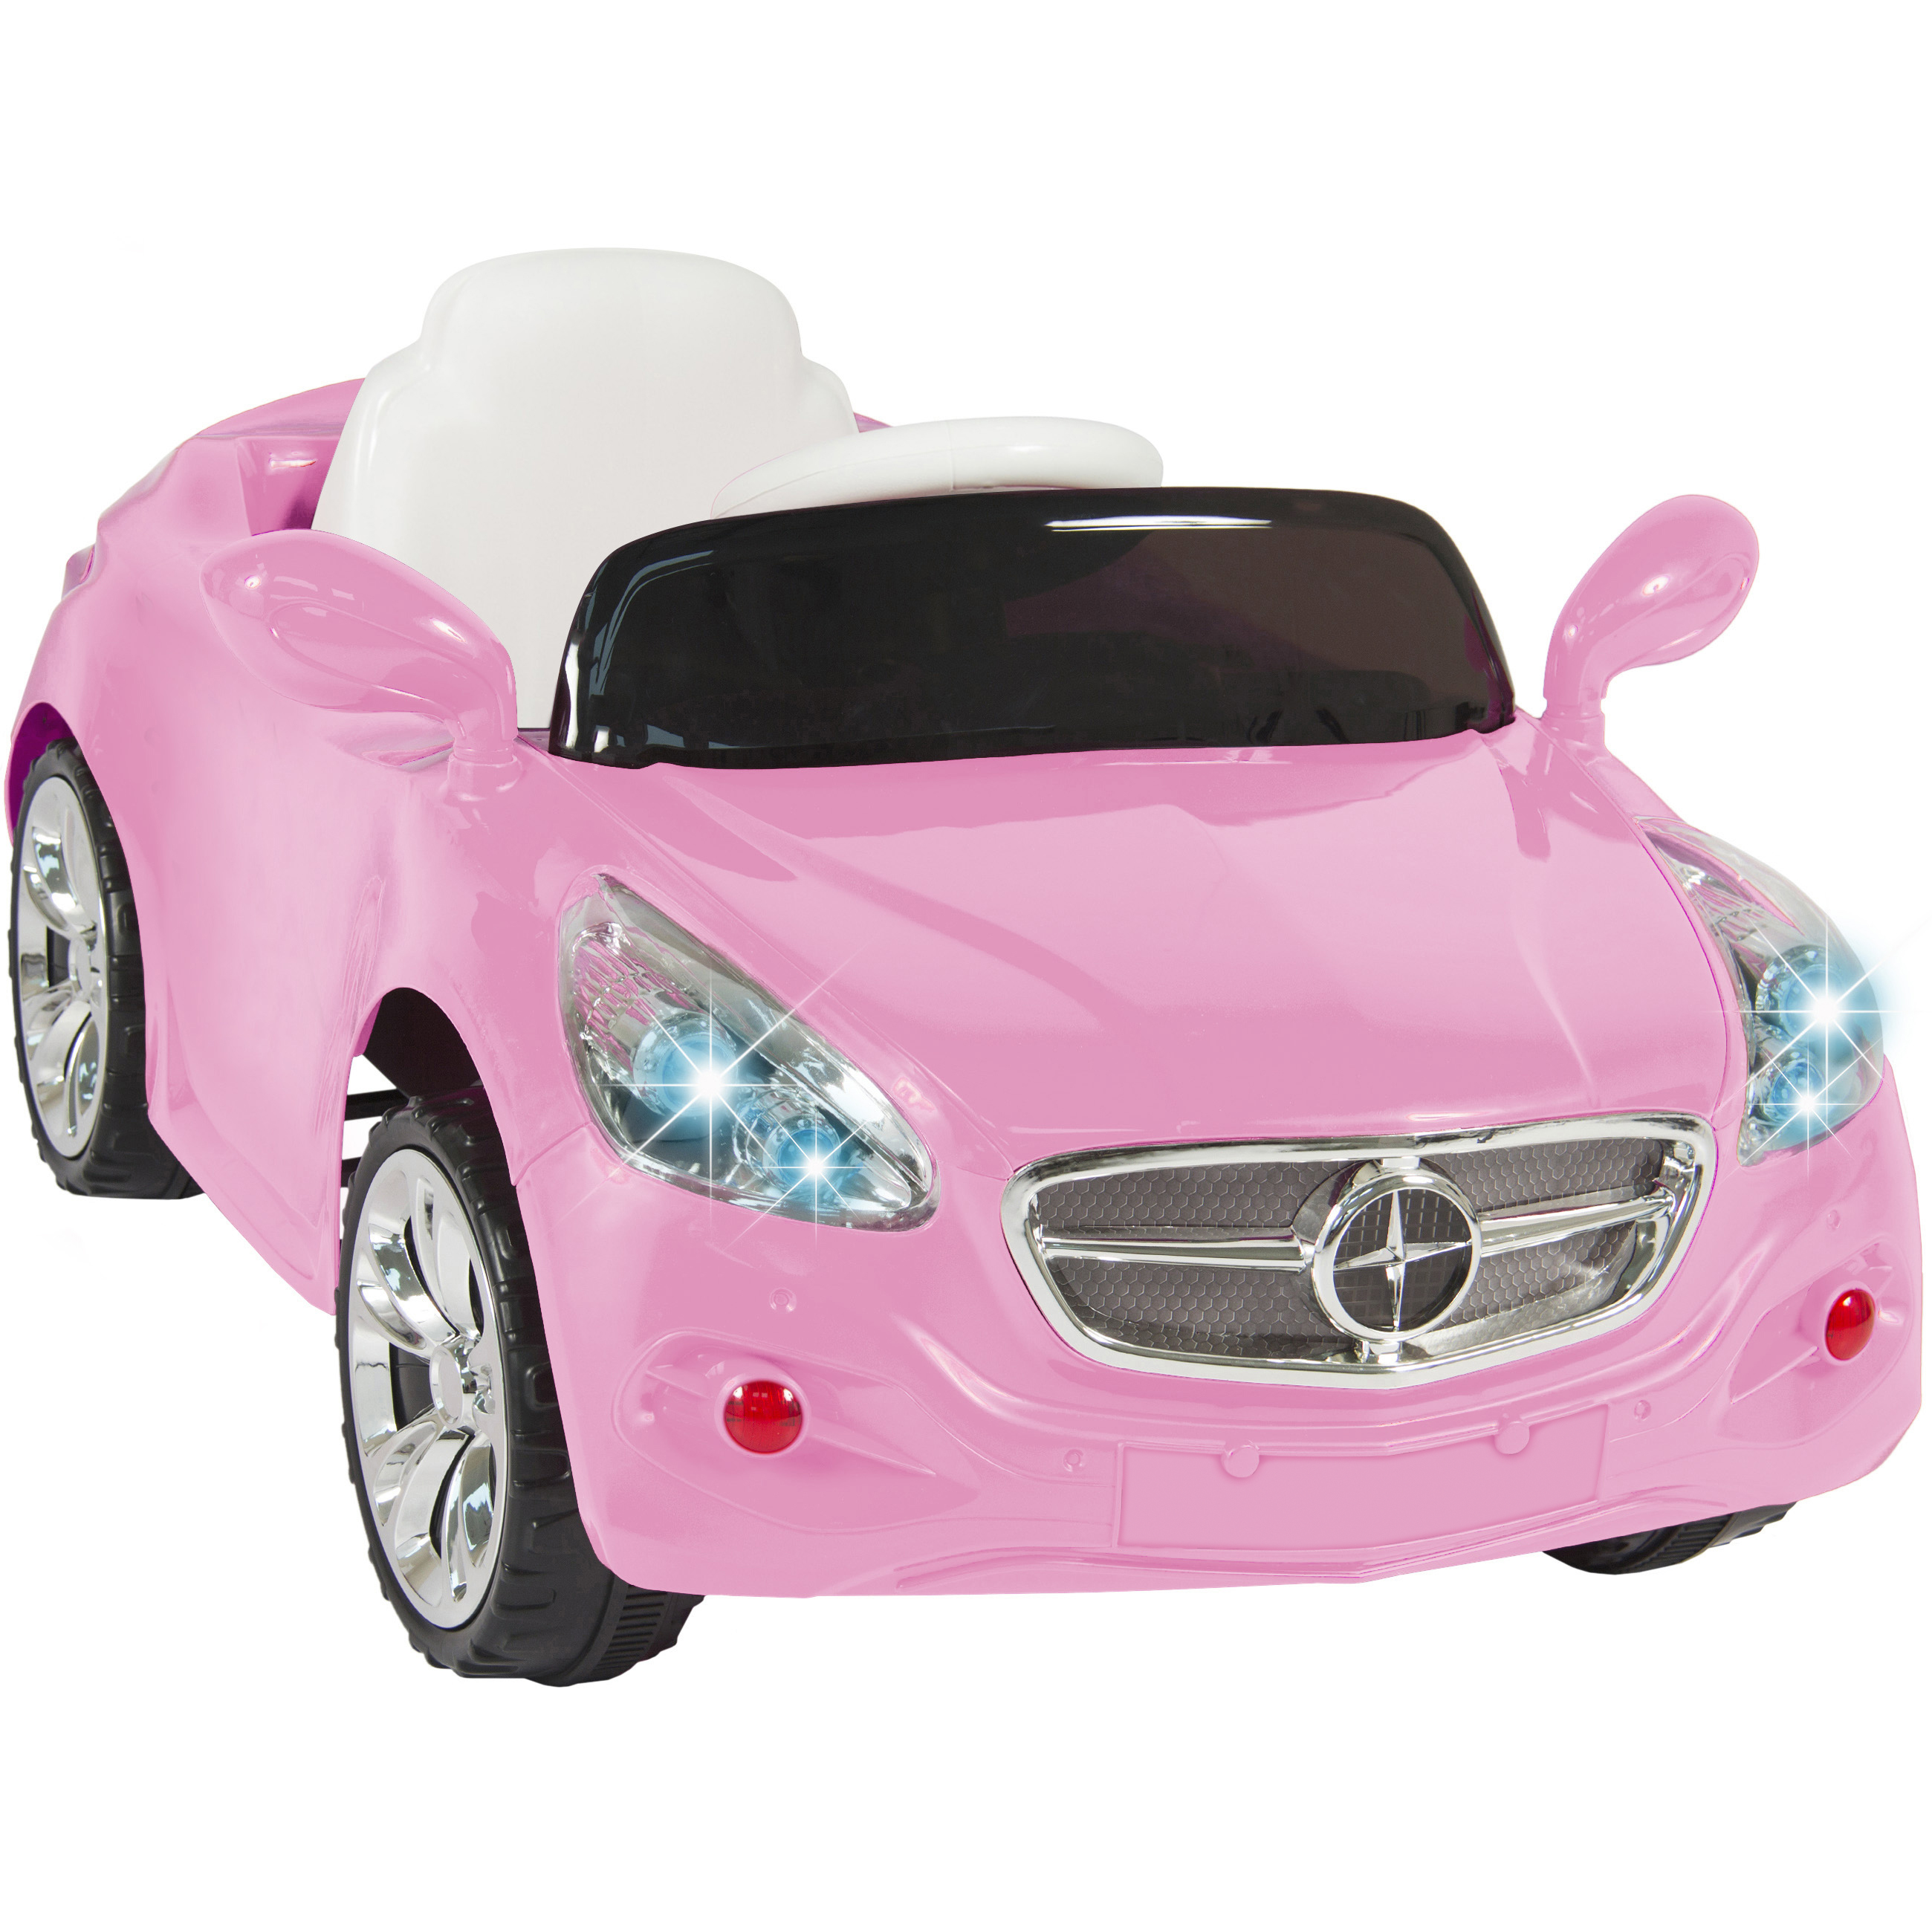 12V Ride on Car Kids RC Car Remote Control Electric Battery Power W/ Radio & MP3